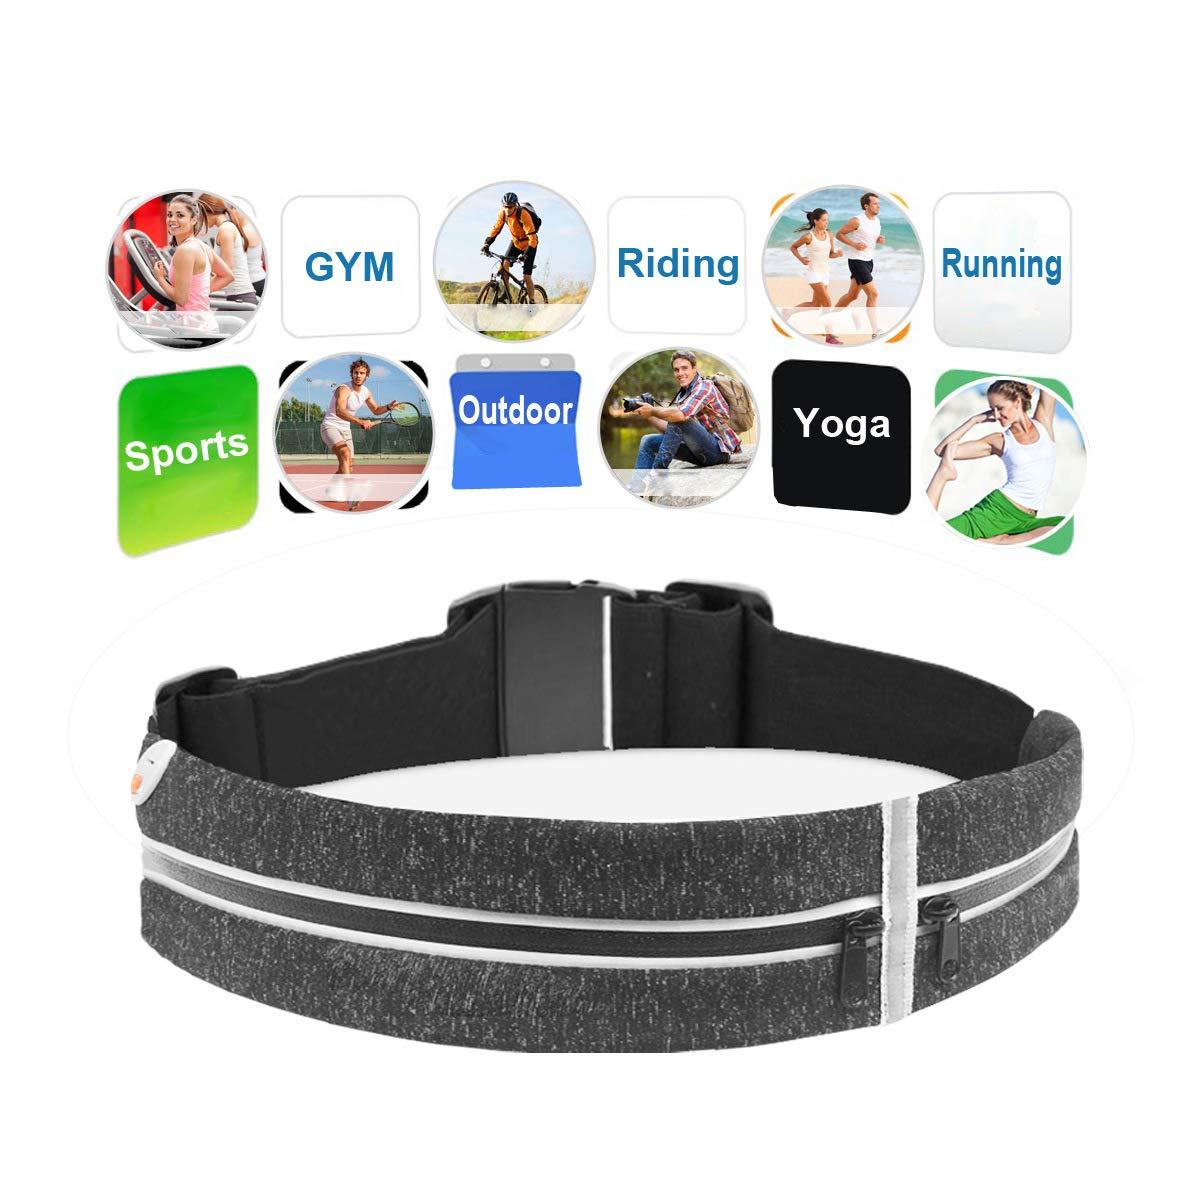 Running Belt for Phone, Fanny Packs for Women Men, Iphone Holder for Running, Phone Belt for IPhone X 6 7 8 Plus, Waterproof Fitness Pouch, Zipper No-Bounce Running Belt(black, one size, 2 pockets)